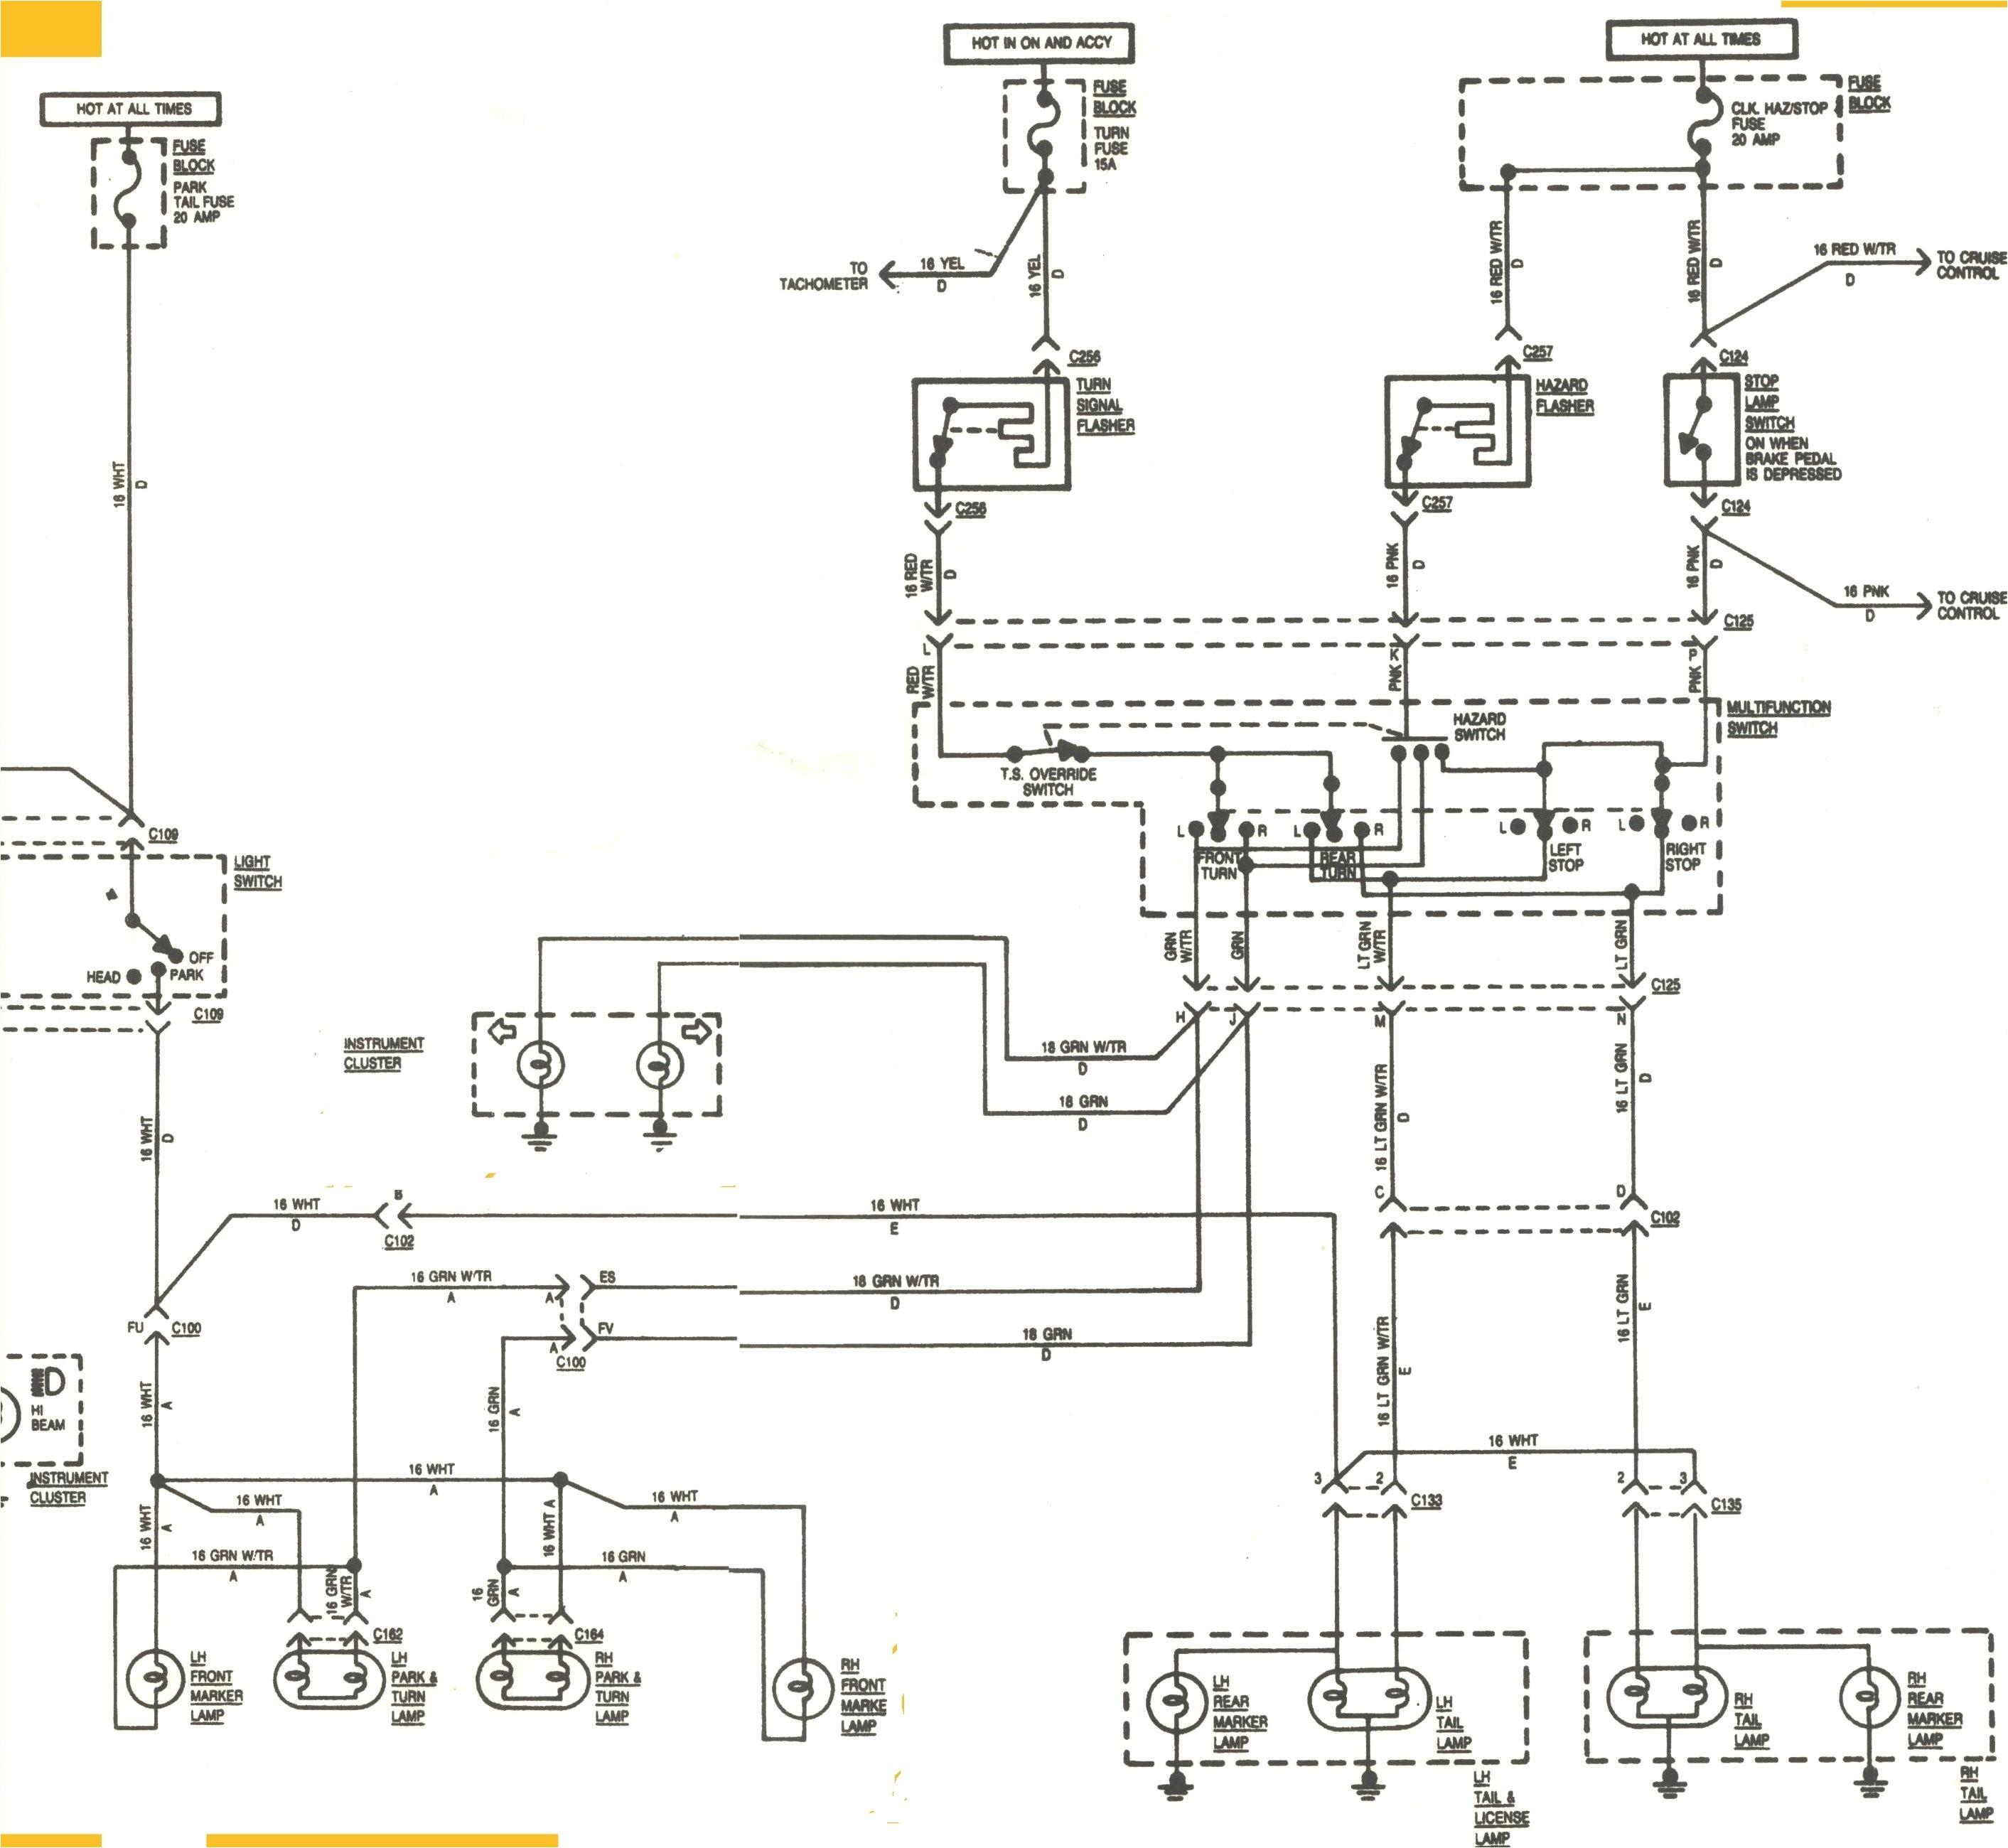 jeep cj wiring diagram 1998 manual e book jeep cj wiring diagram 1998